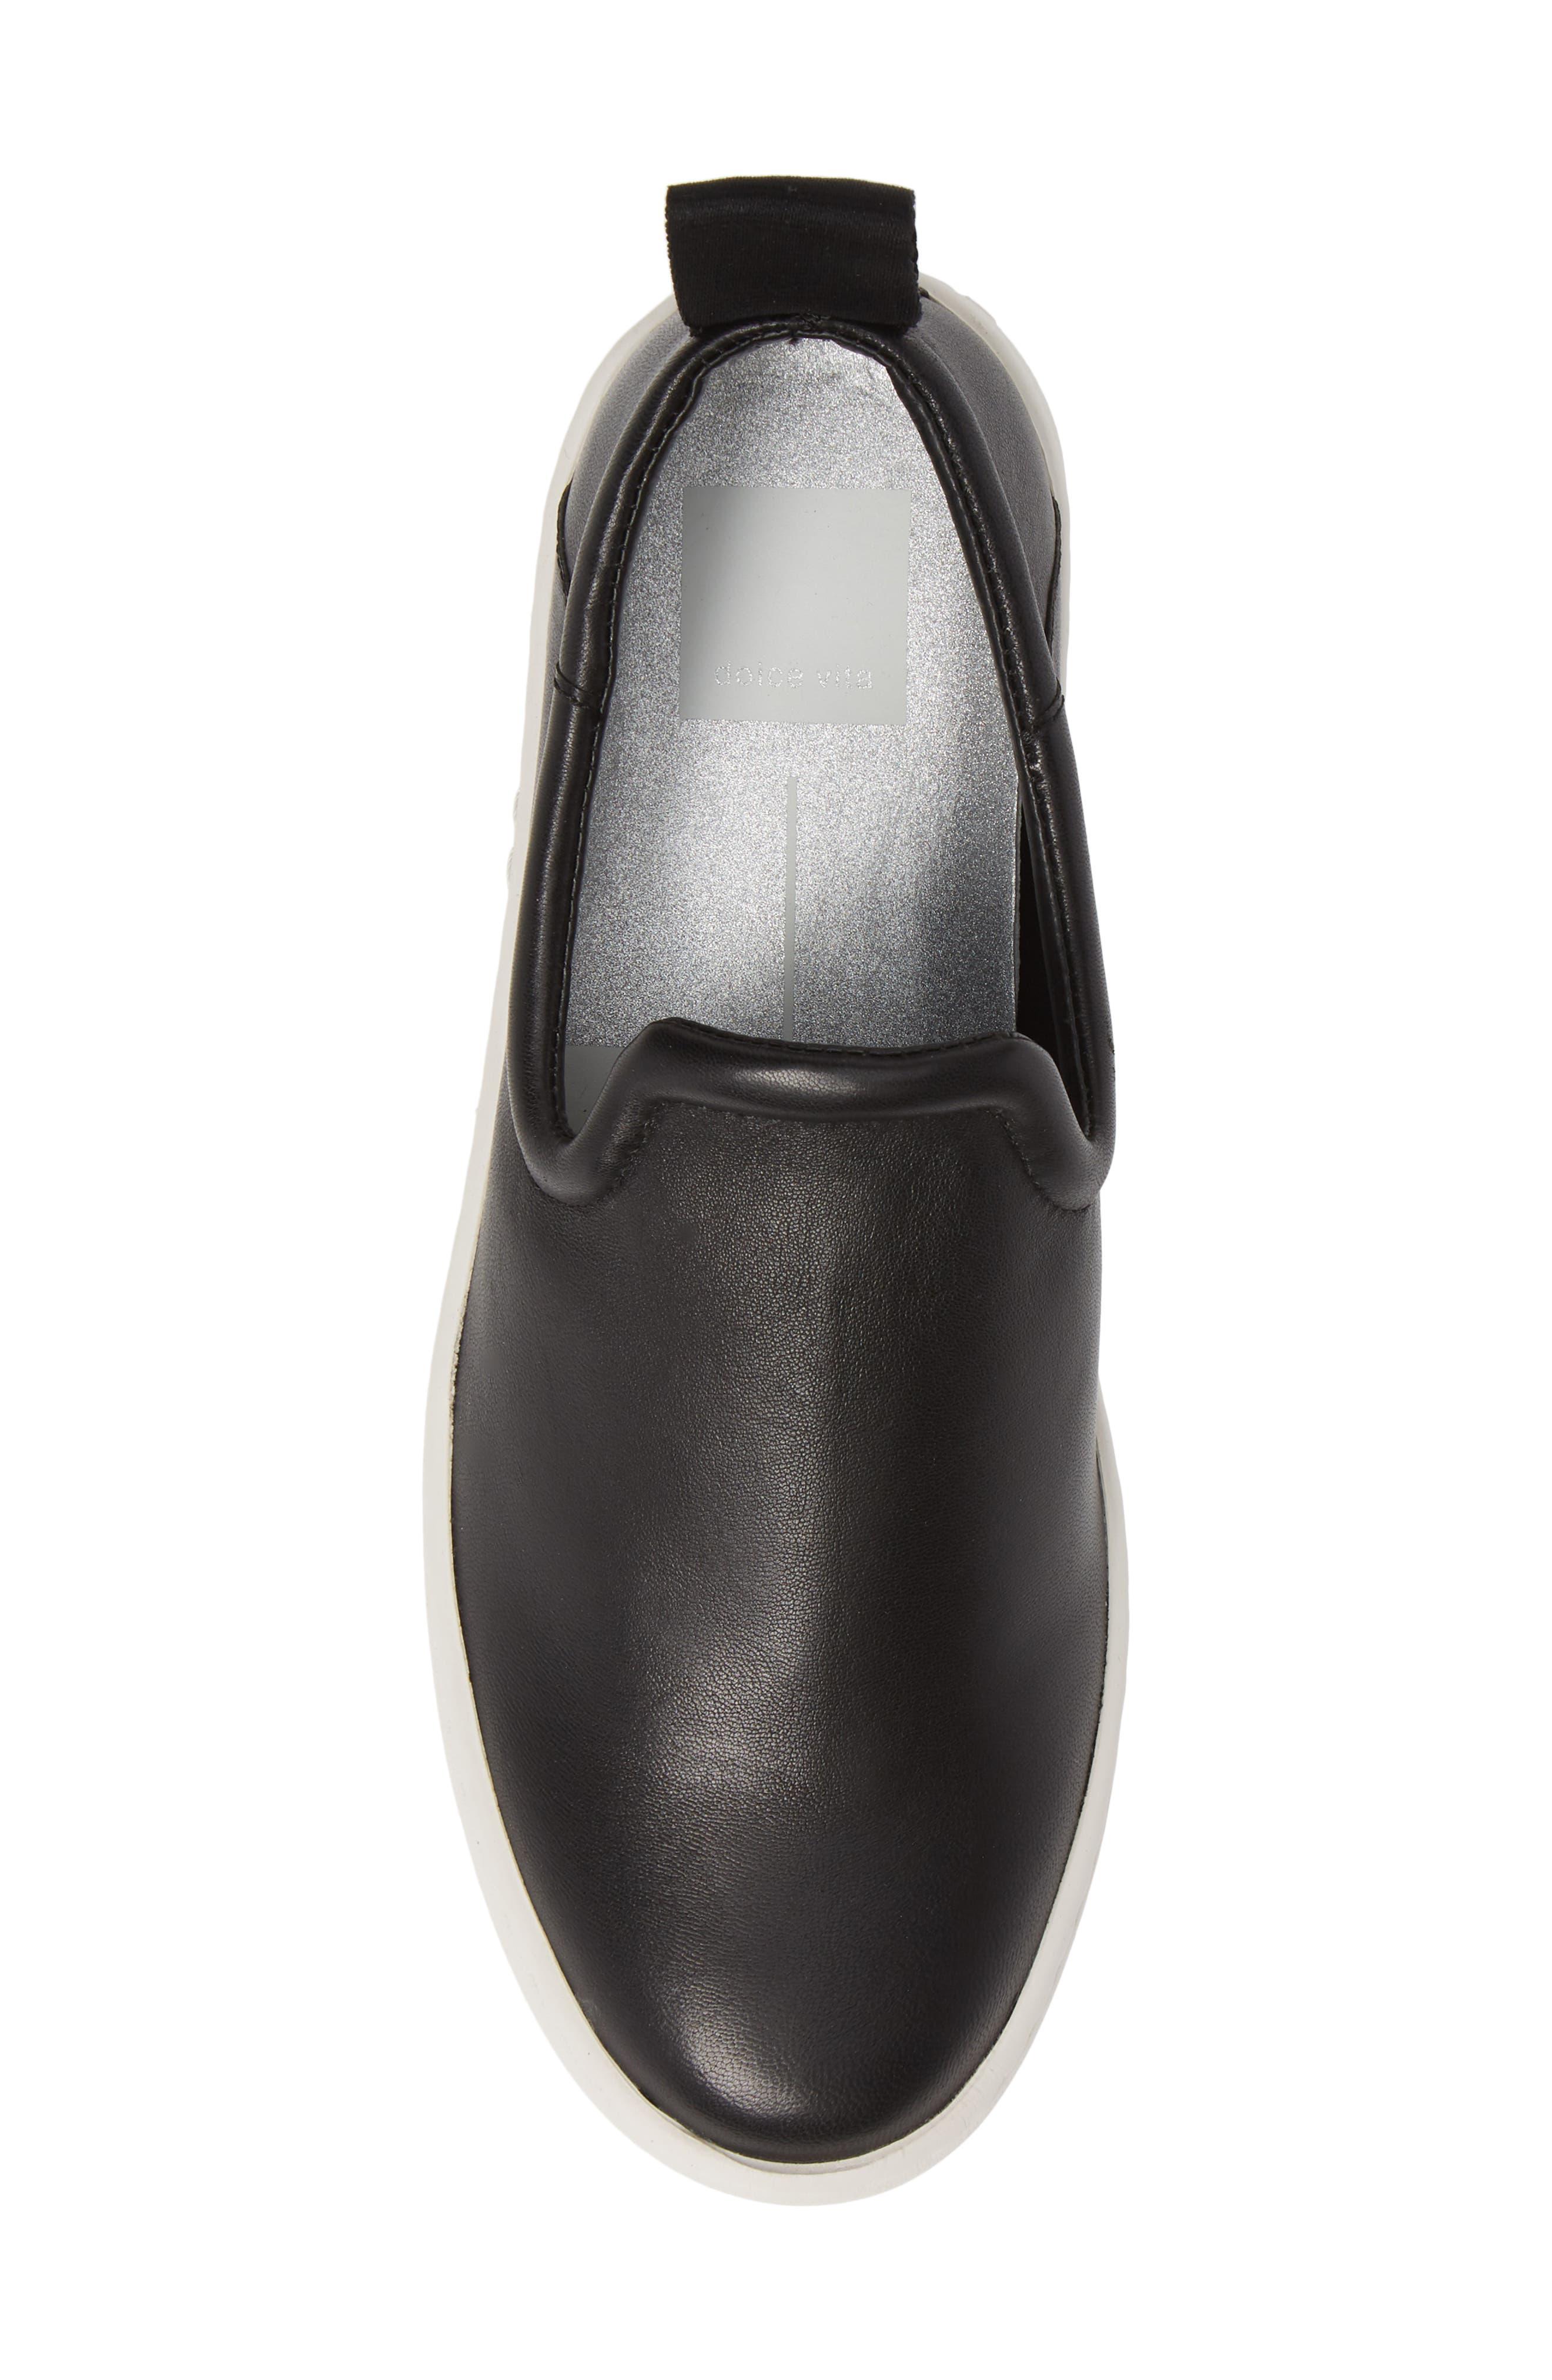 DOLCE VITA, Tag Slip-On Sneaker, Alternate thumbnail 5, color, BLACK LEATHER